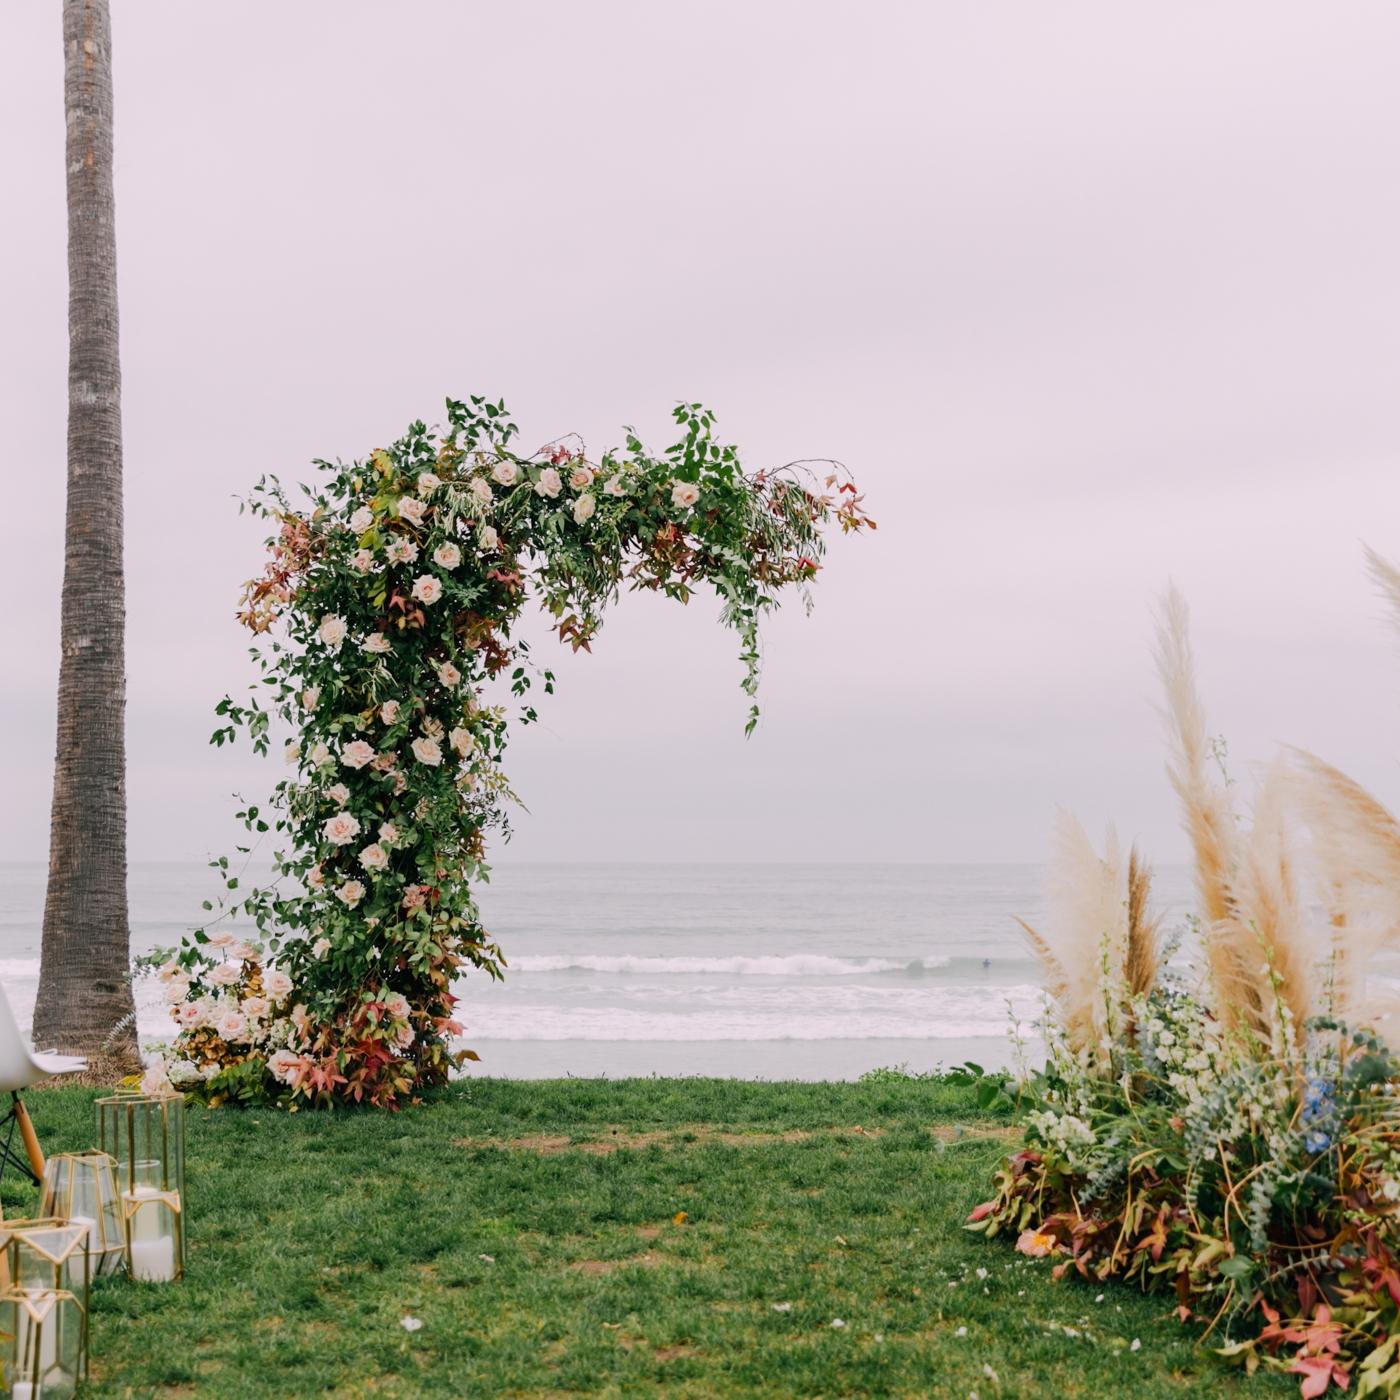 Fairytale by the sea - La Jolla, CA